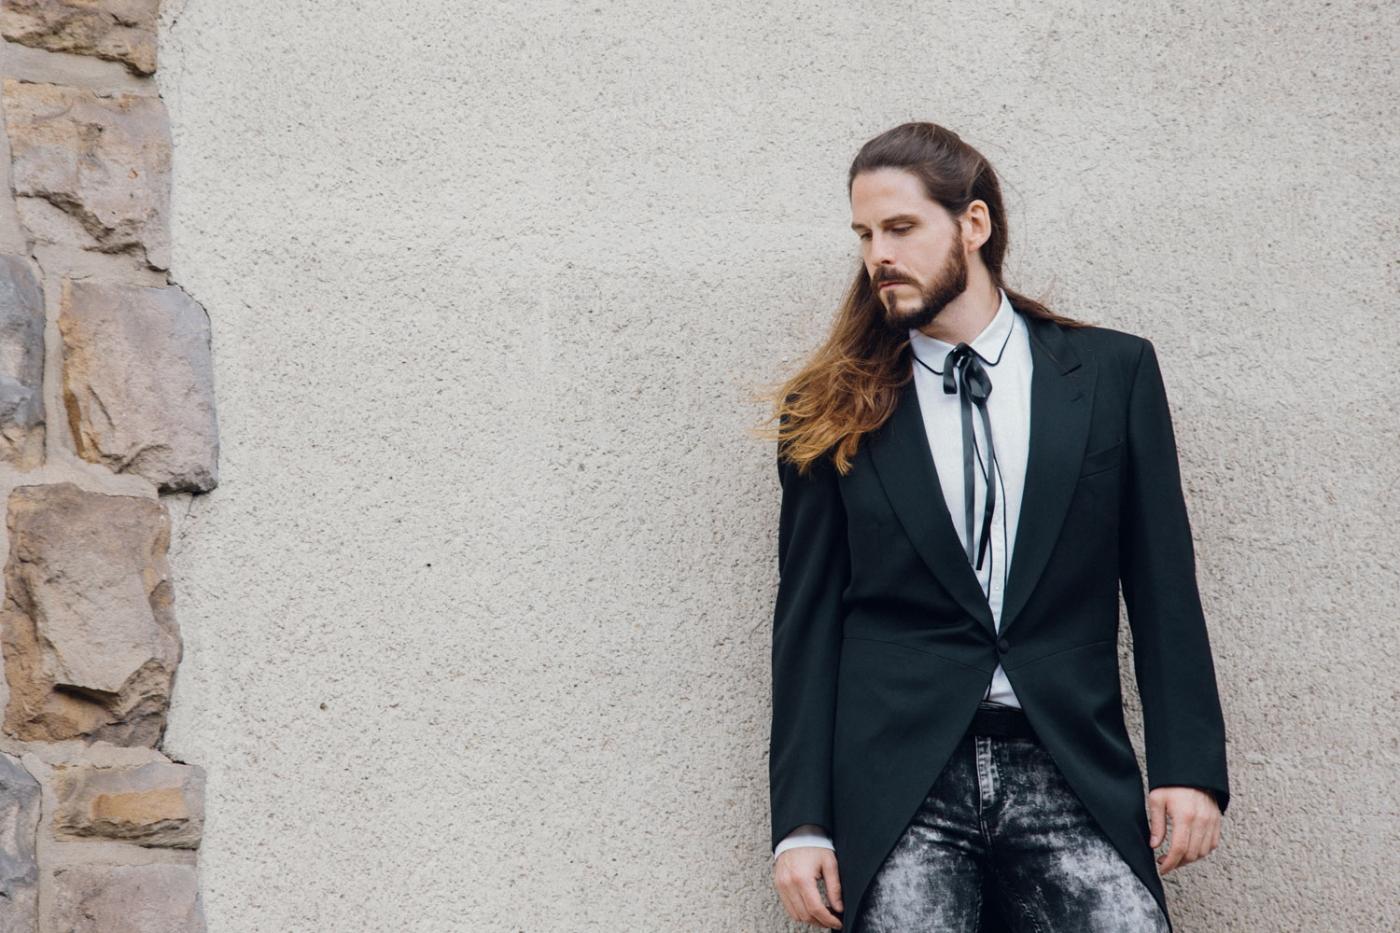 kaisers-neue-kleider-maennermode-blog-luxus-frack-yves-saint-laurent-skinny-jeans-kombiniert-outfit